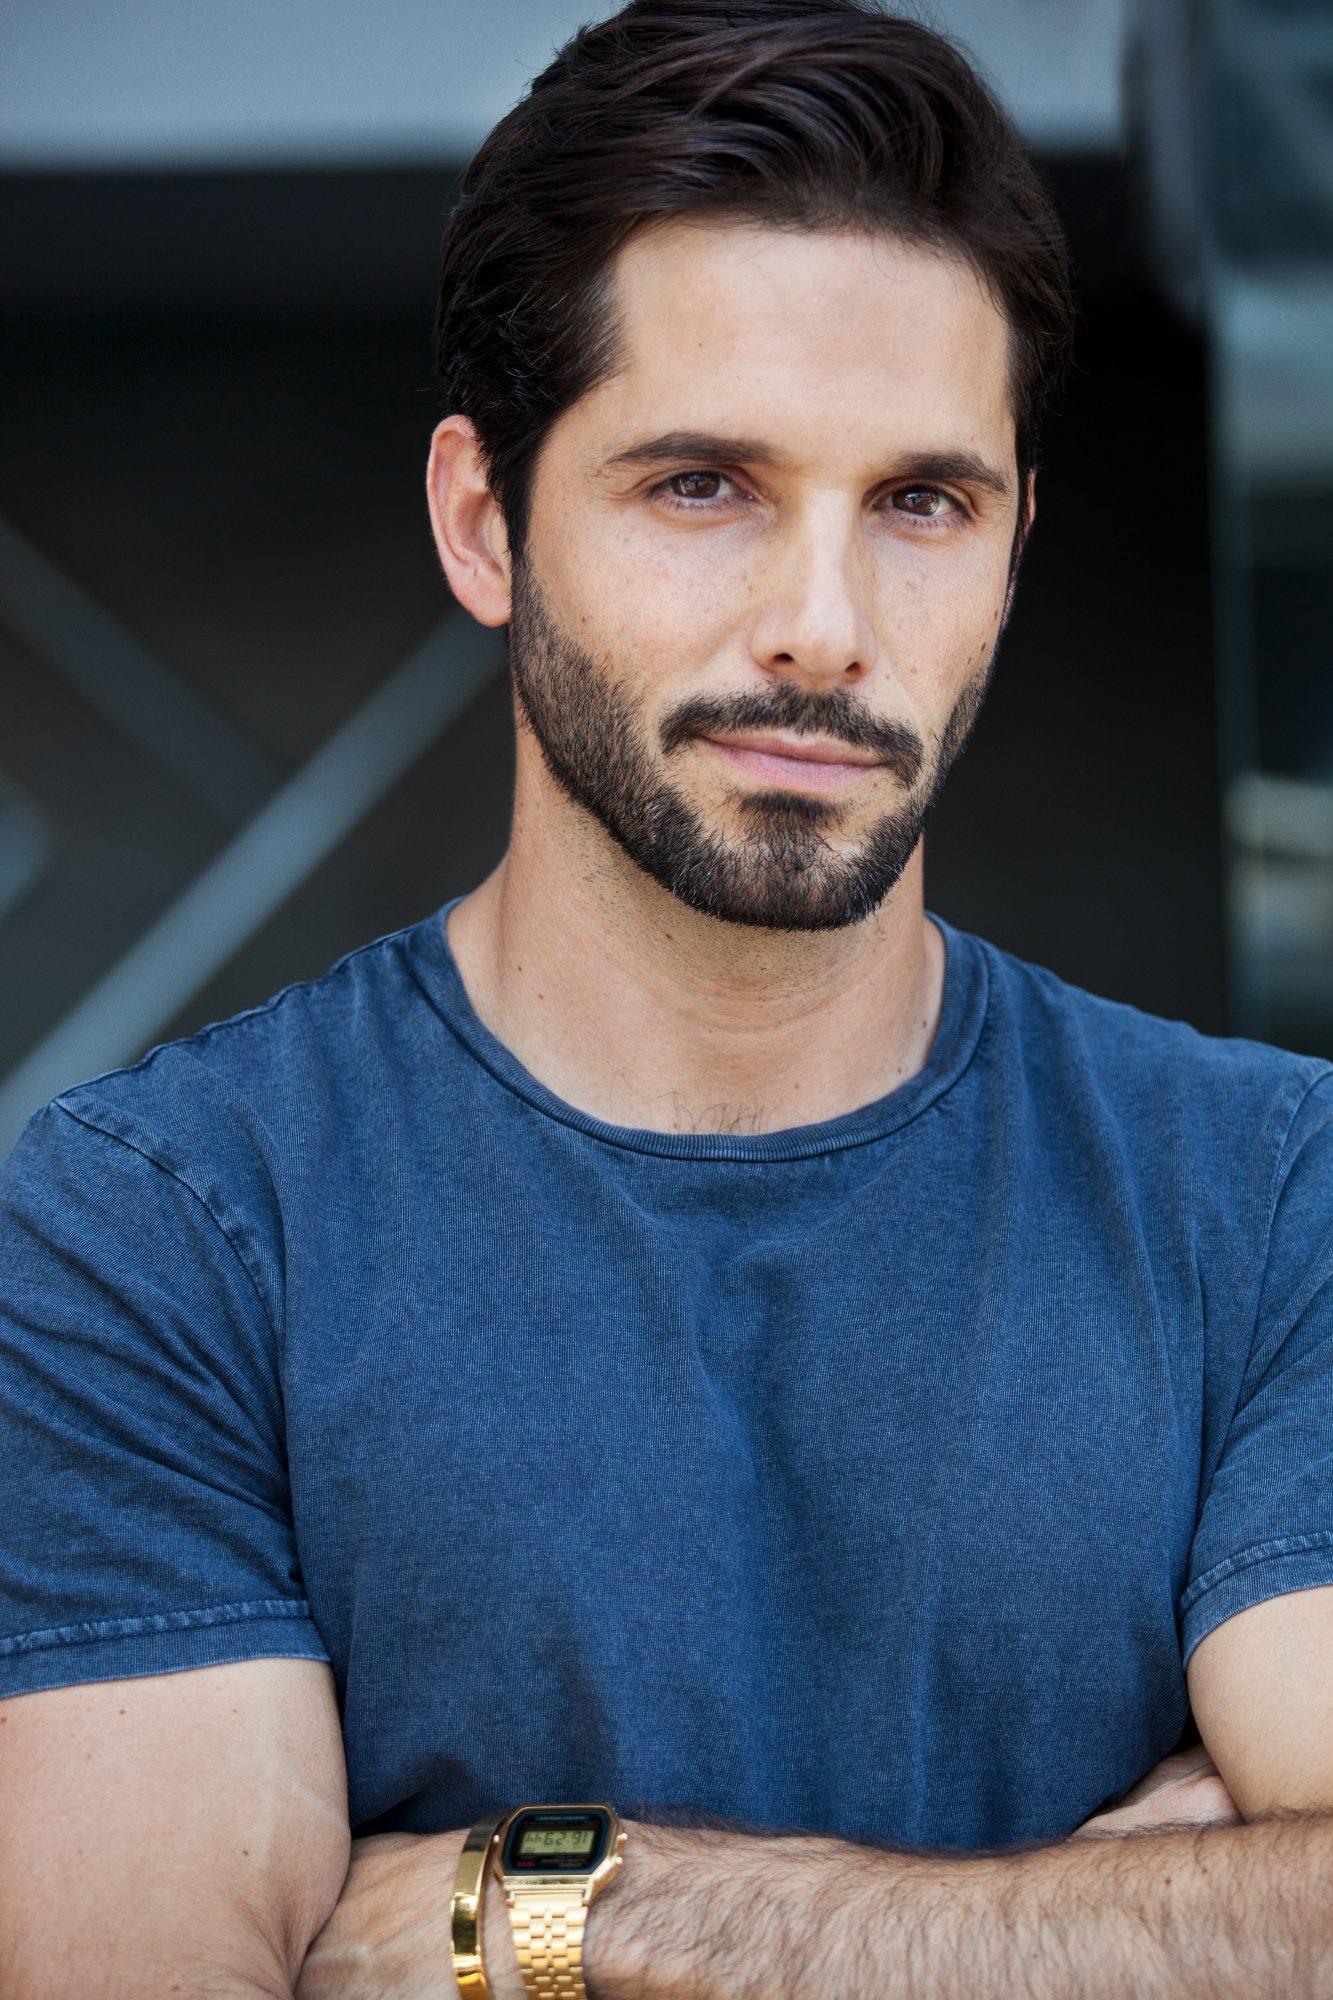 Lucas Velazquez